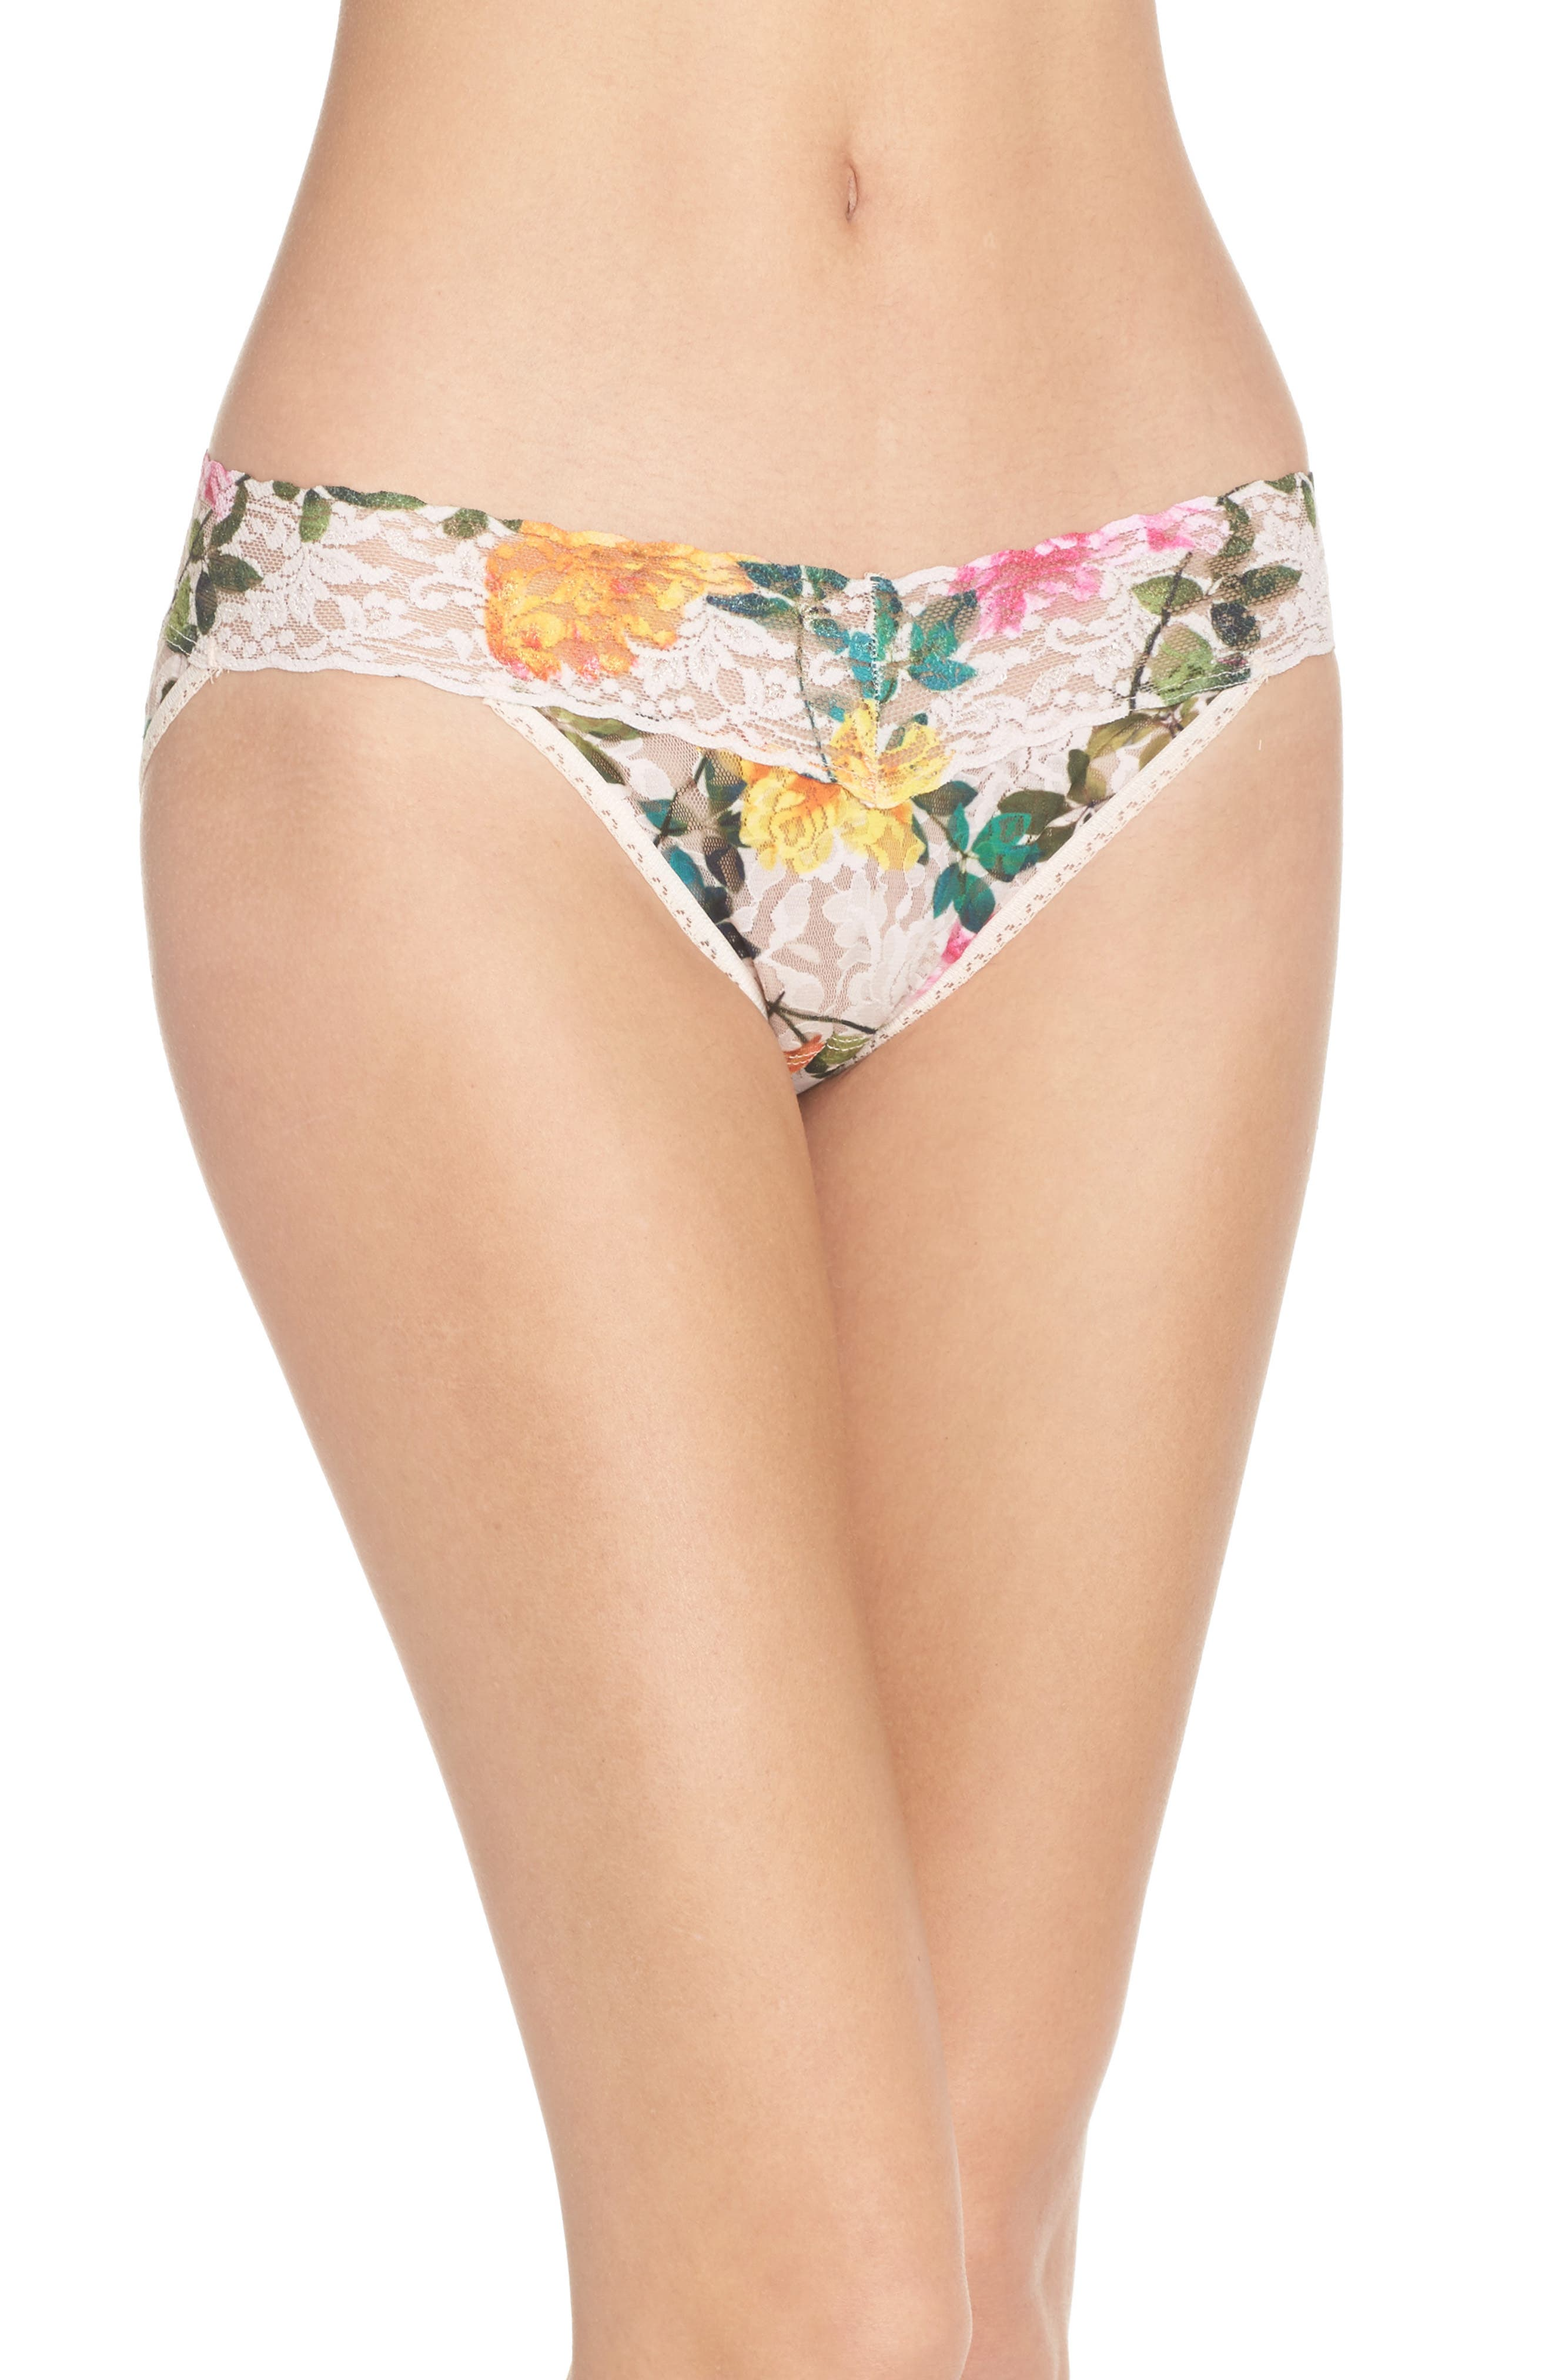 Alternate Image 1 Selected - Hanky Panky Print V-Kini Bikini